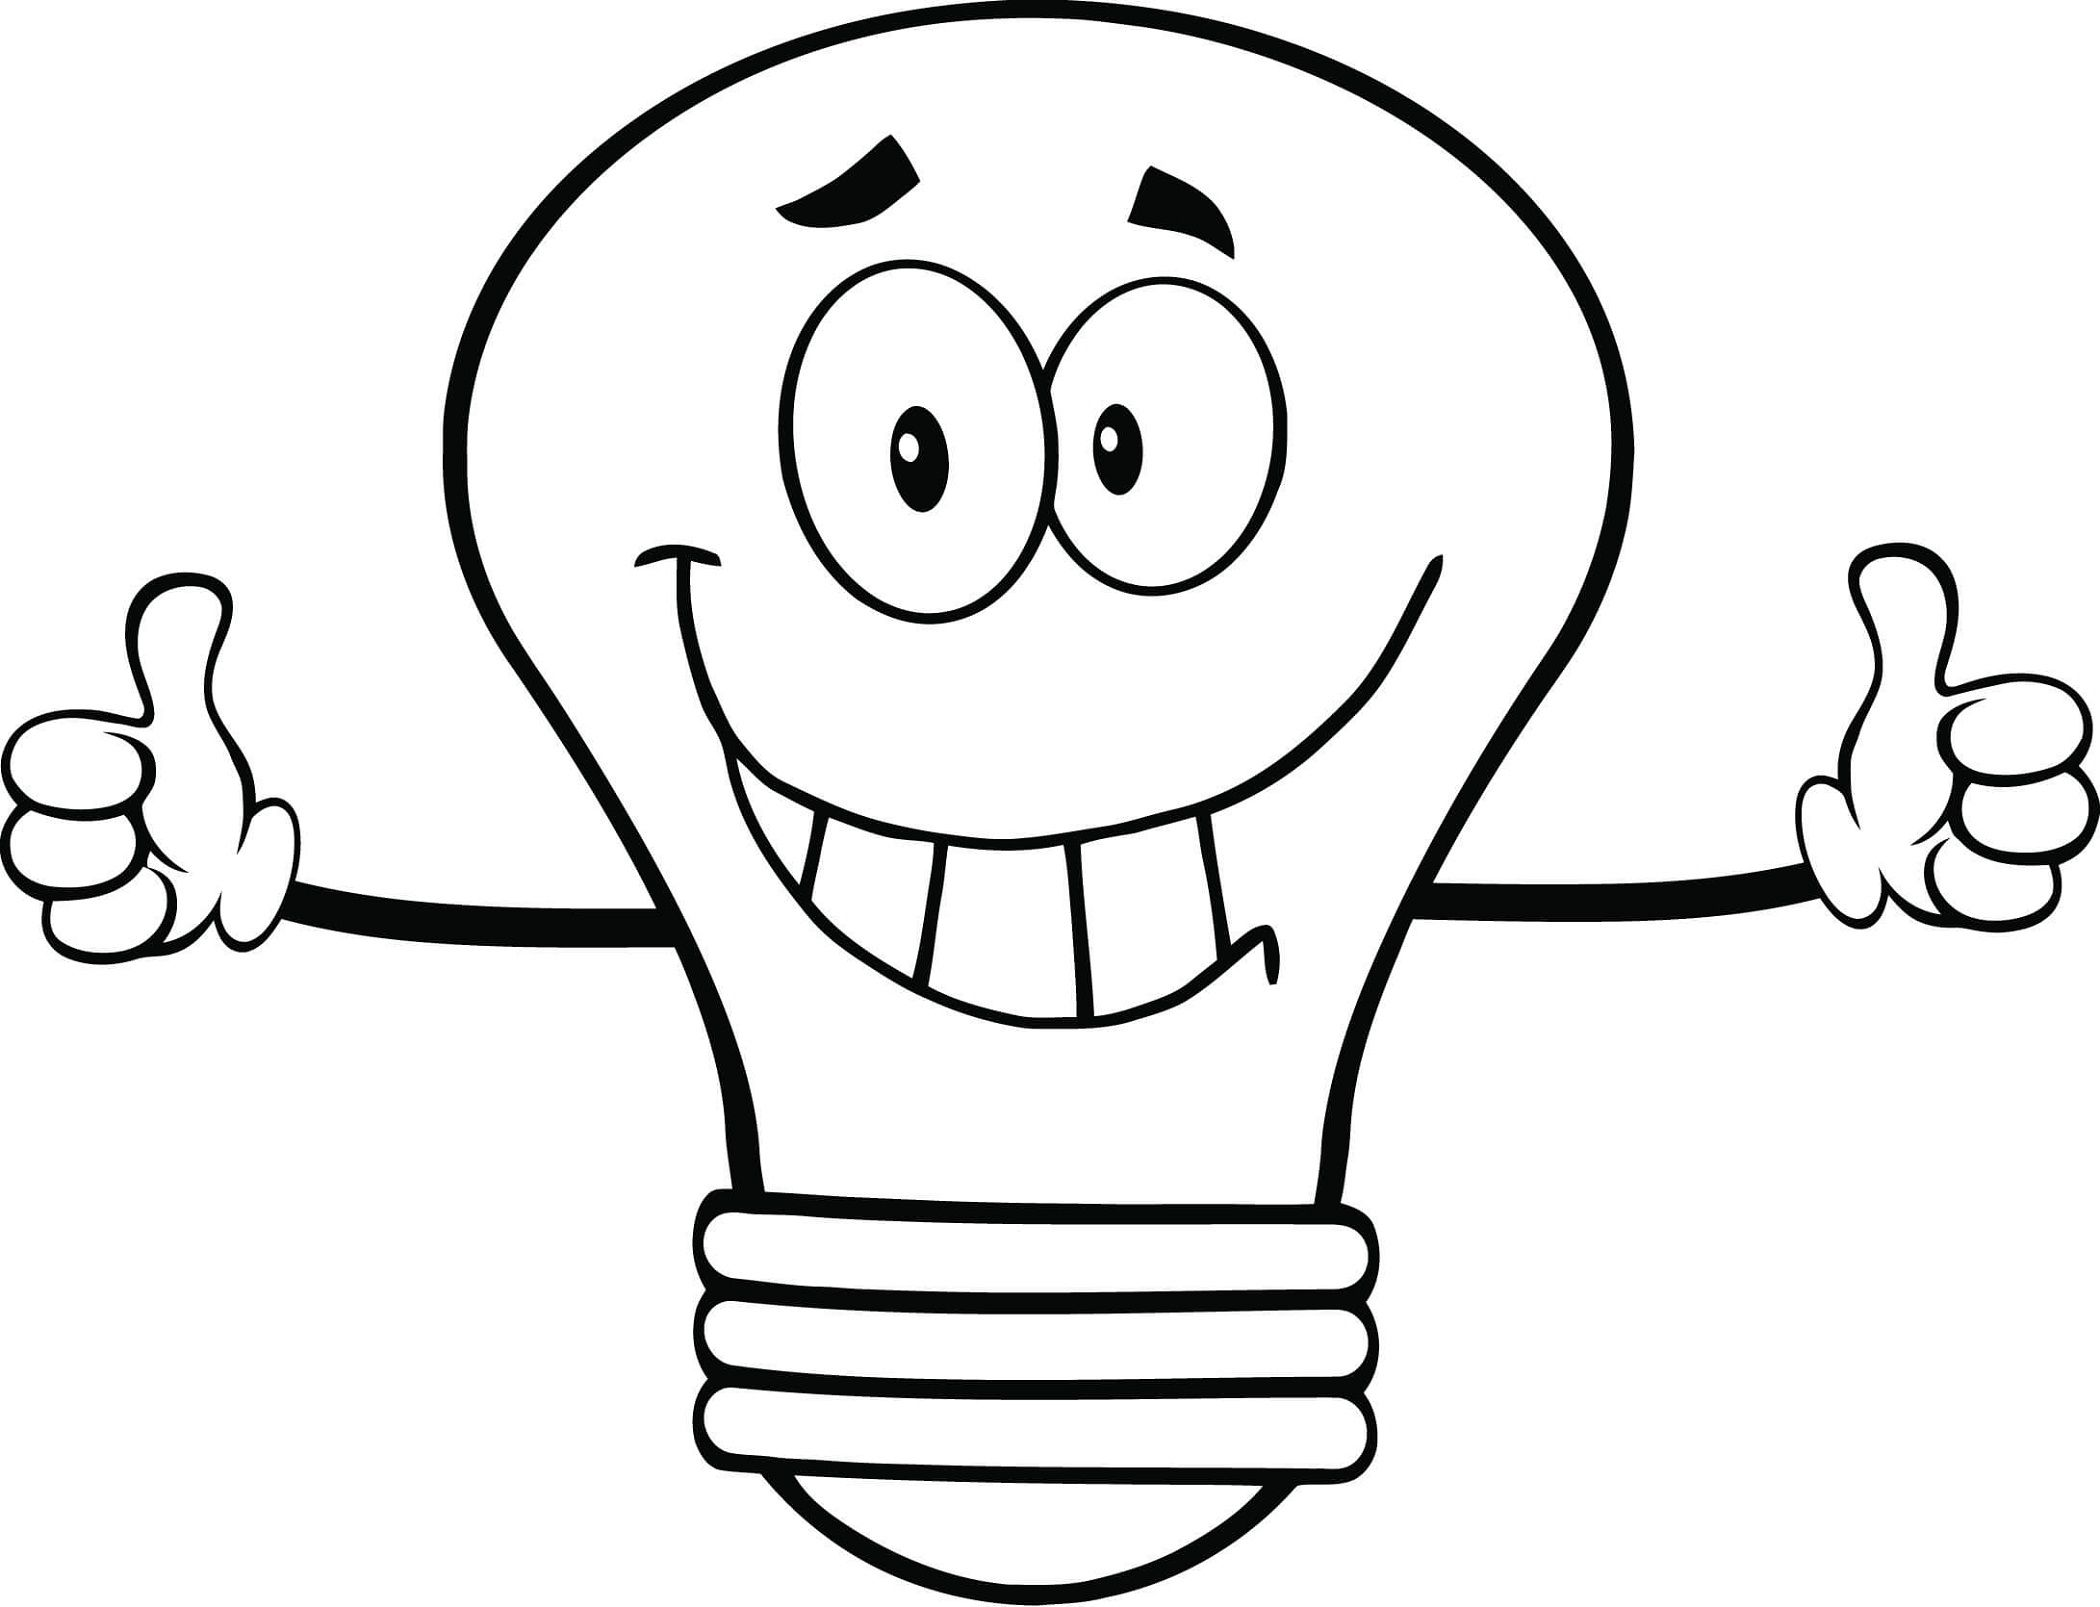 Light Bulb Coloring Pages Coloring Pages Coloring Worksheets For Kindergarten Free Printable Coloring Pages